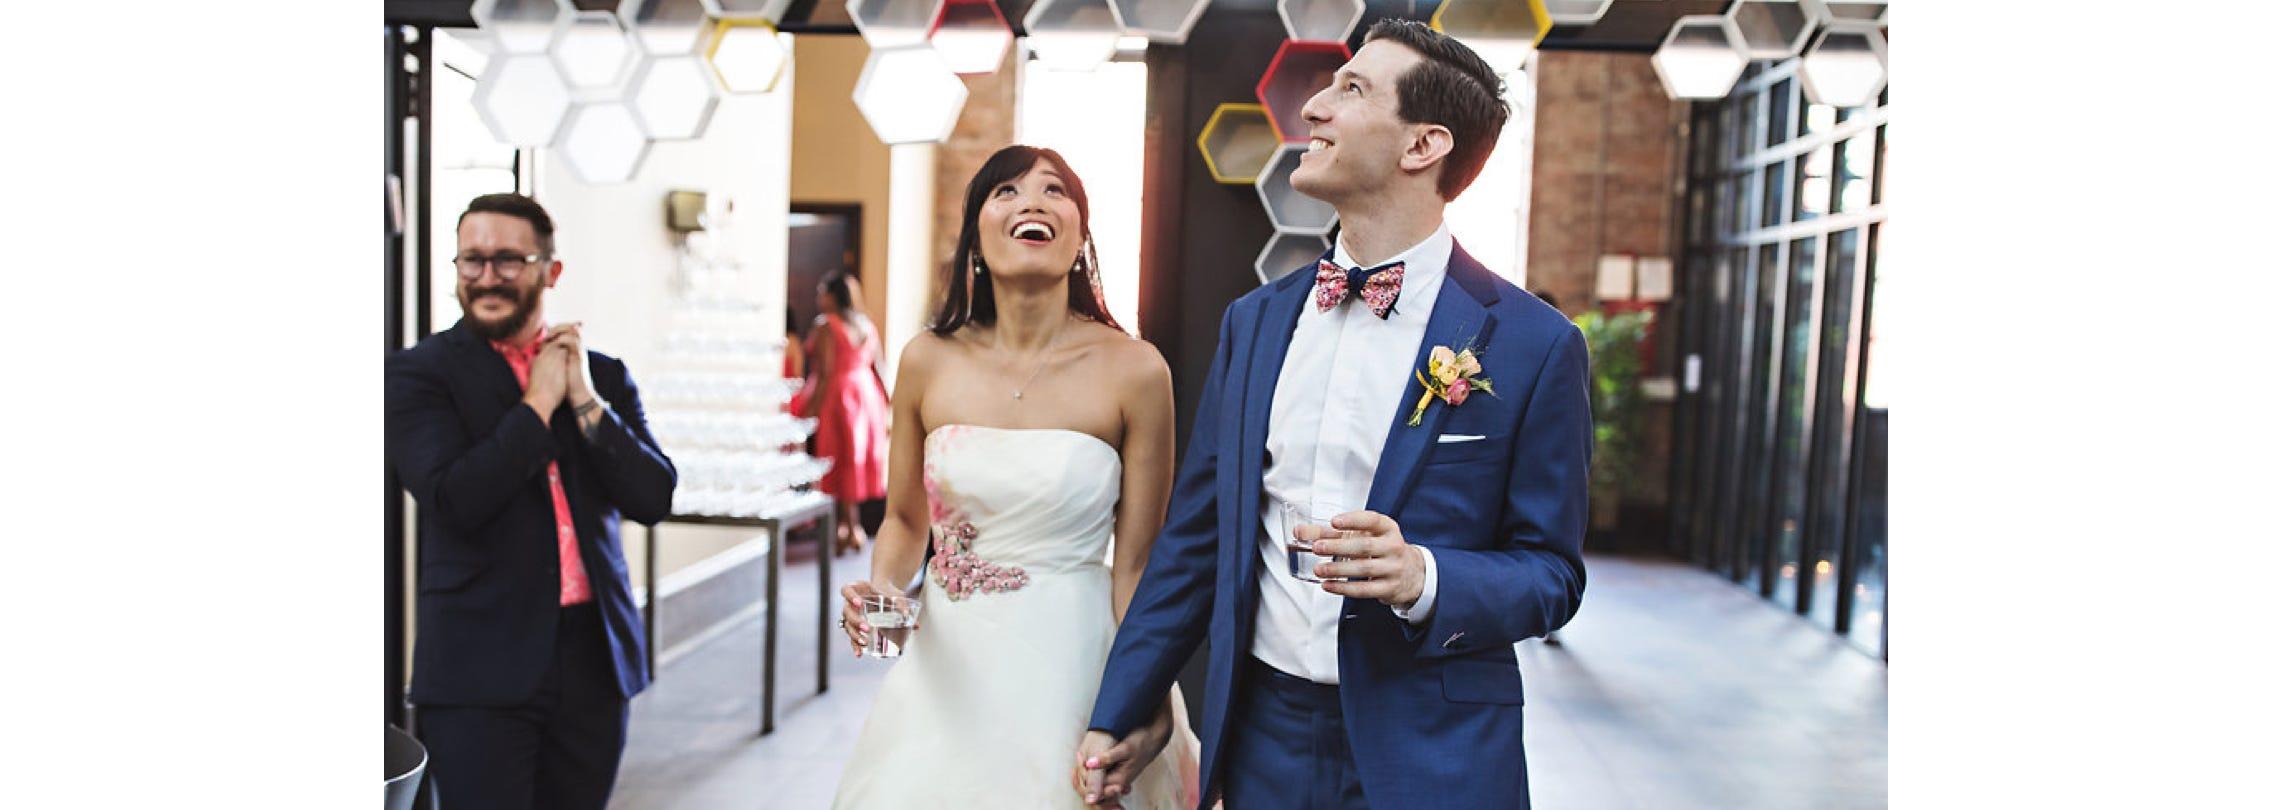 Rescheduling A Wedding: Plan Ahead